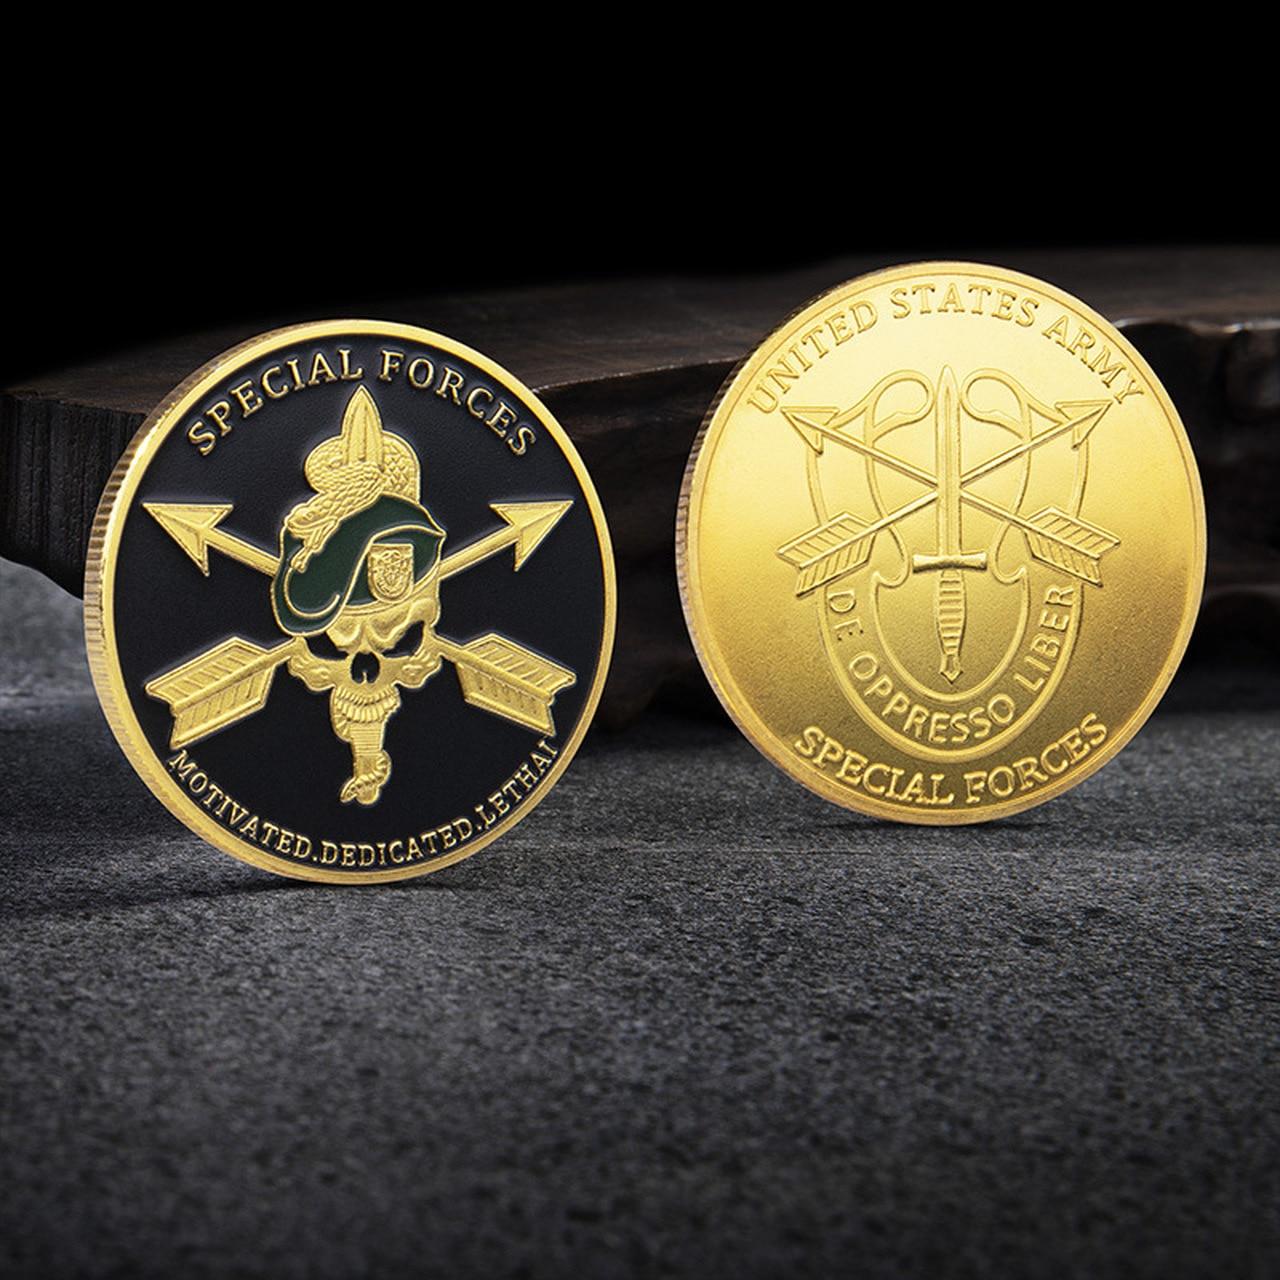 Двусторонняя Золотая монета спецназа в стиле милитари США, золотая монета, памятная монета, коллекция монет, значок, подарок